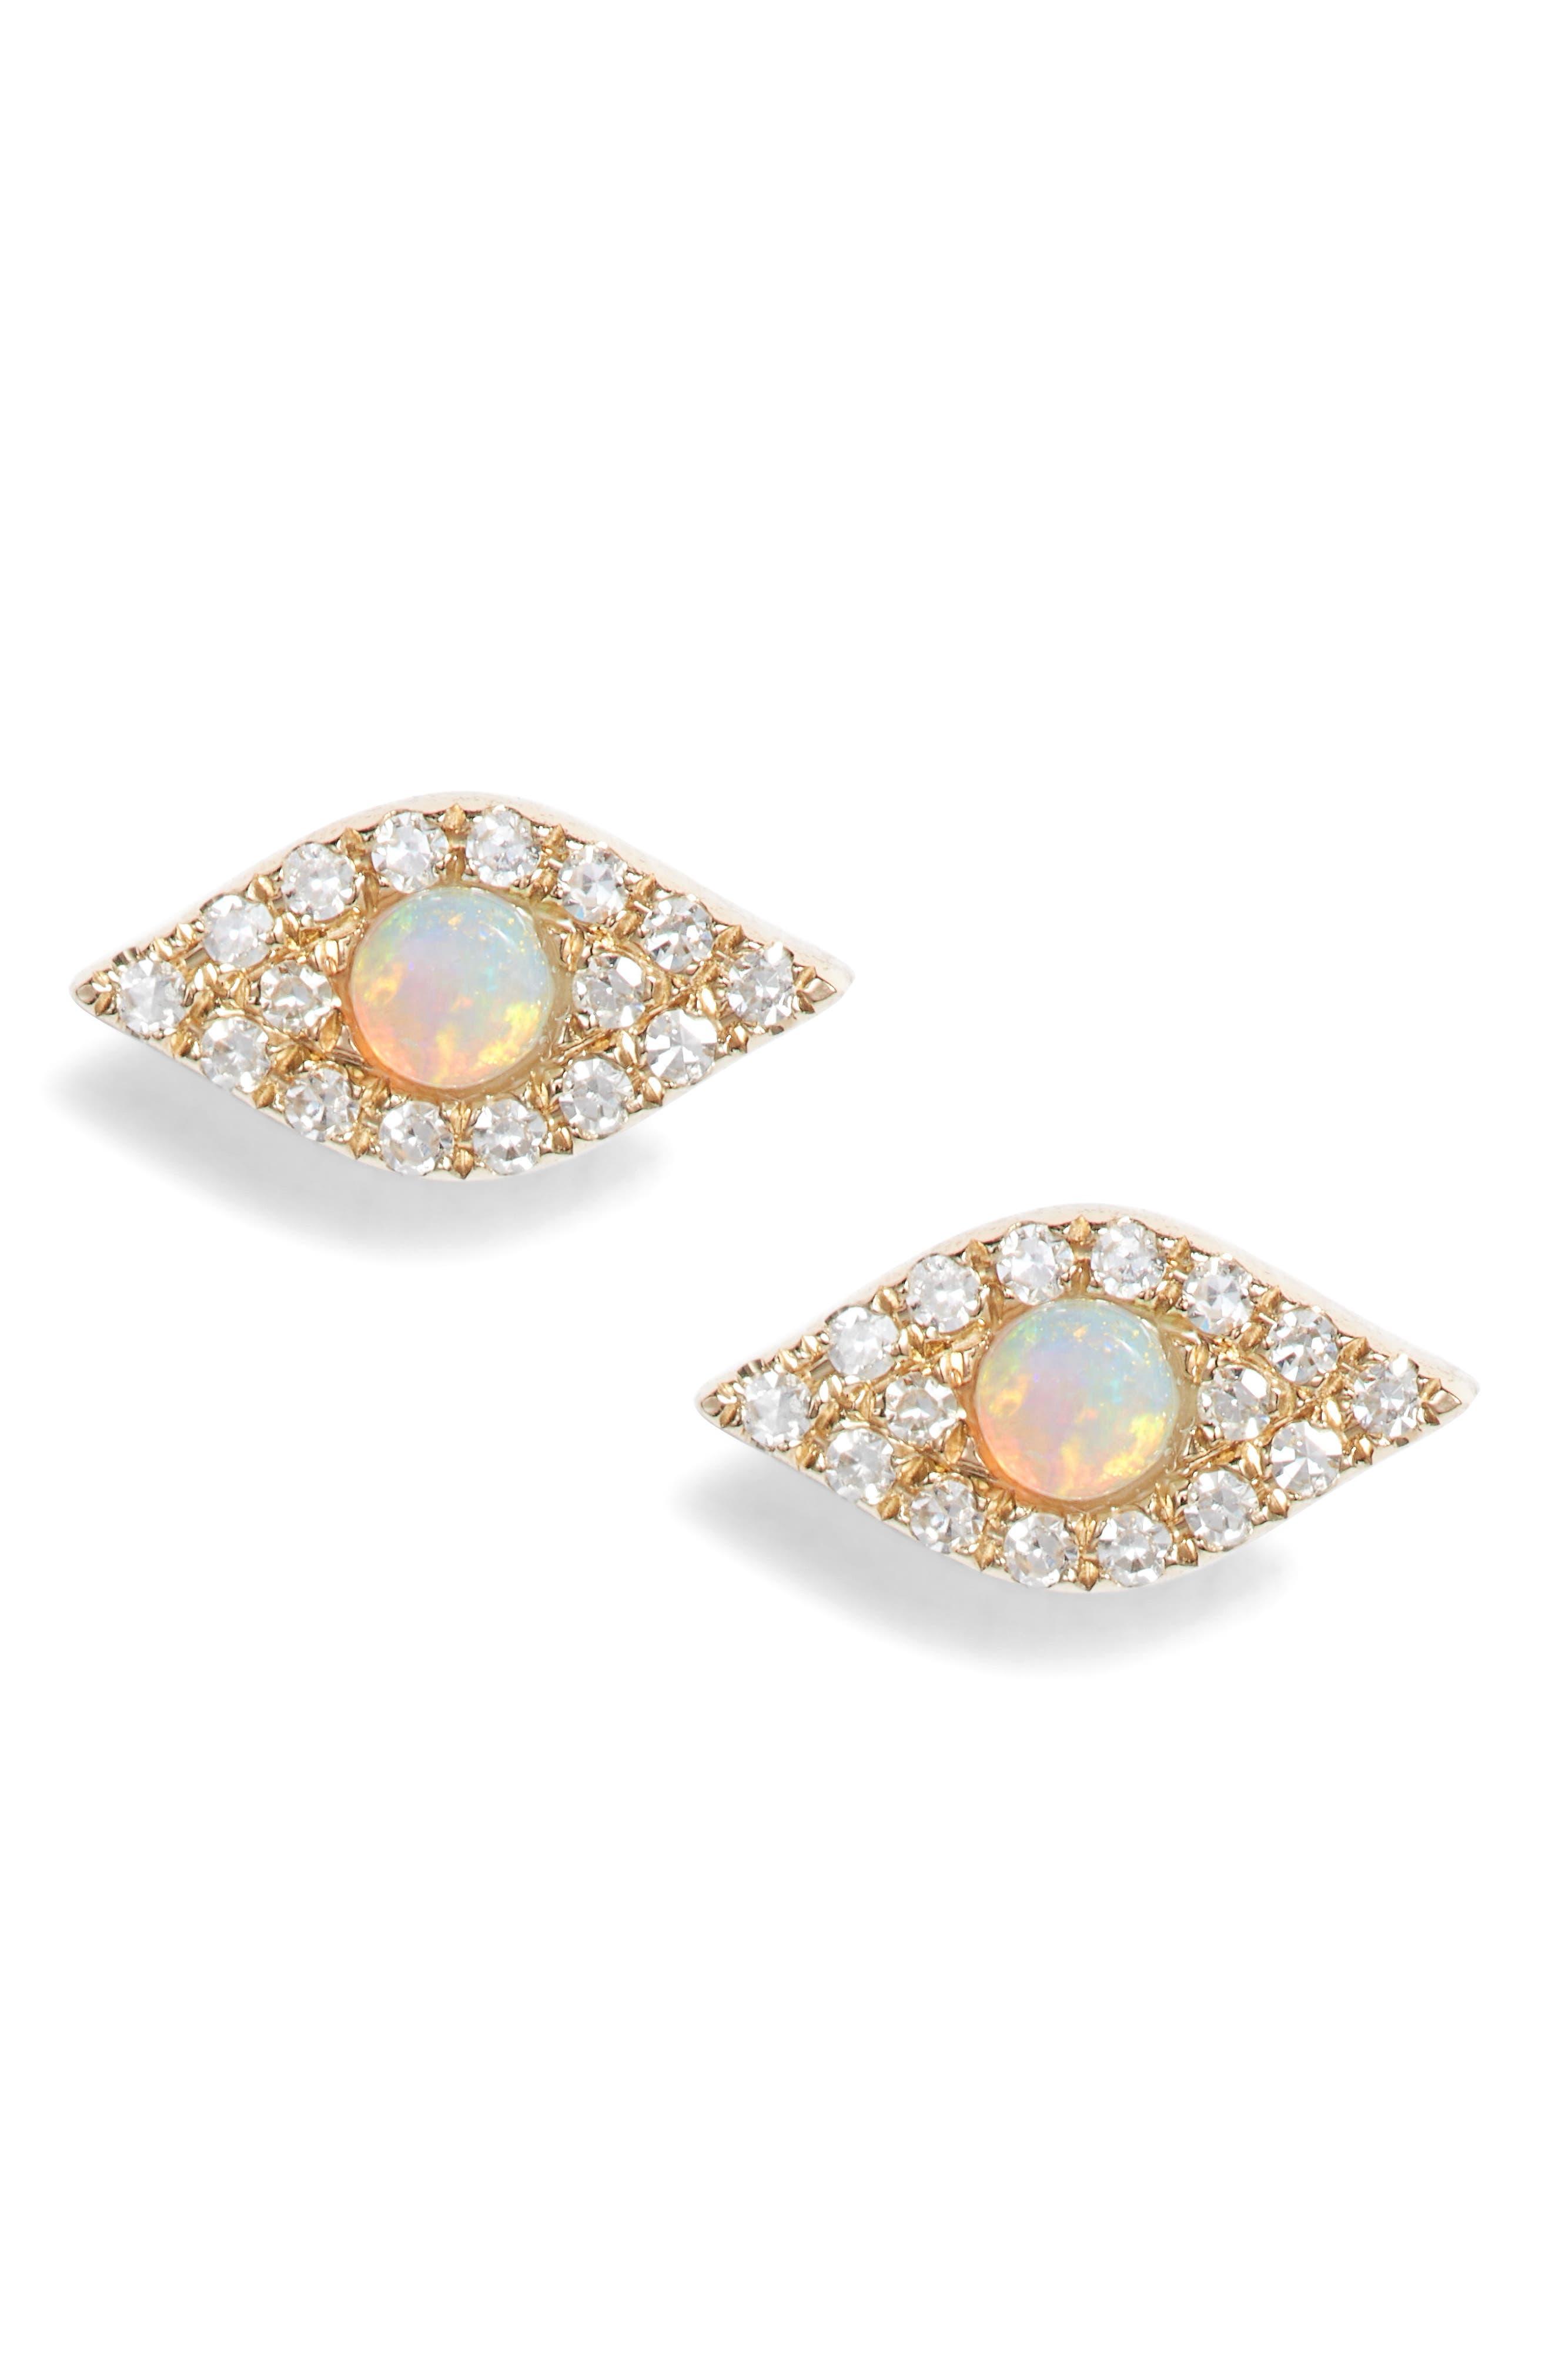 Evil Eye Diamond & Opal Stud Earrings,                         Main,                         color, Yellow Gold/ Opal